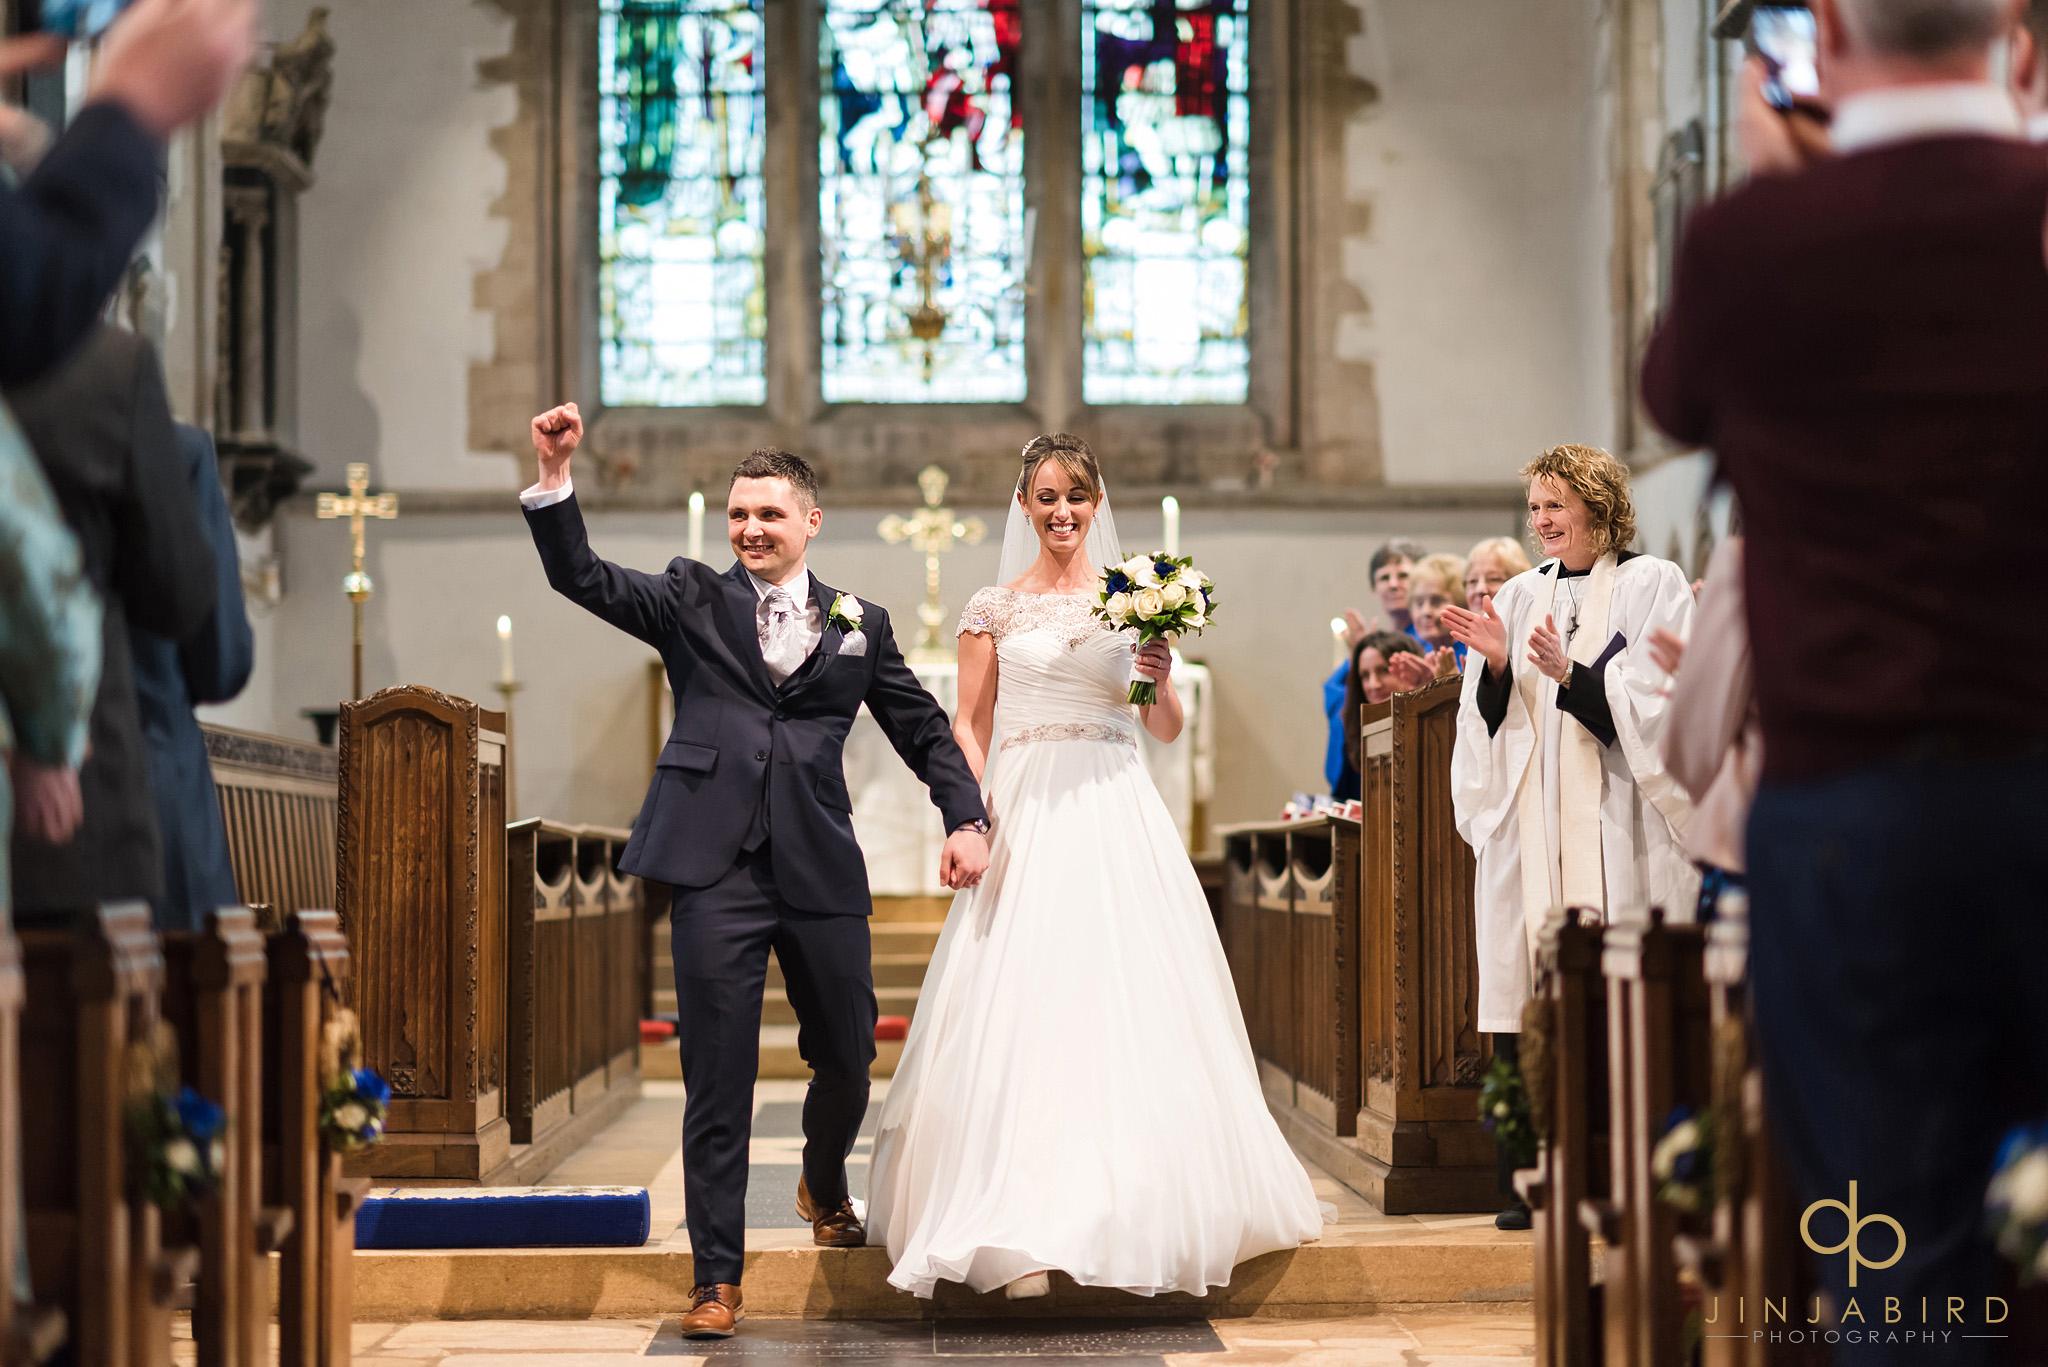 brdie and groom coming down aisle somersham church